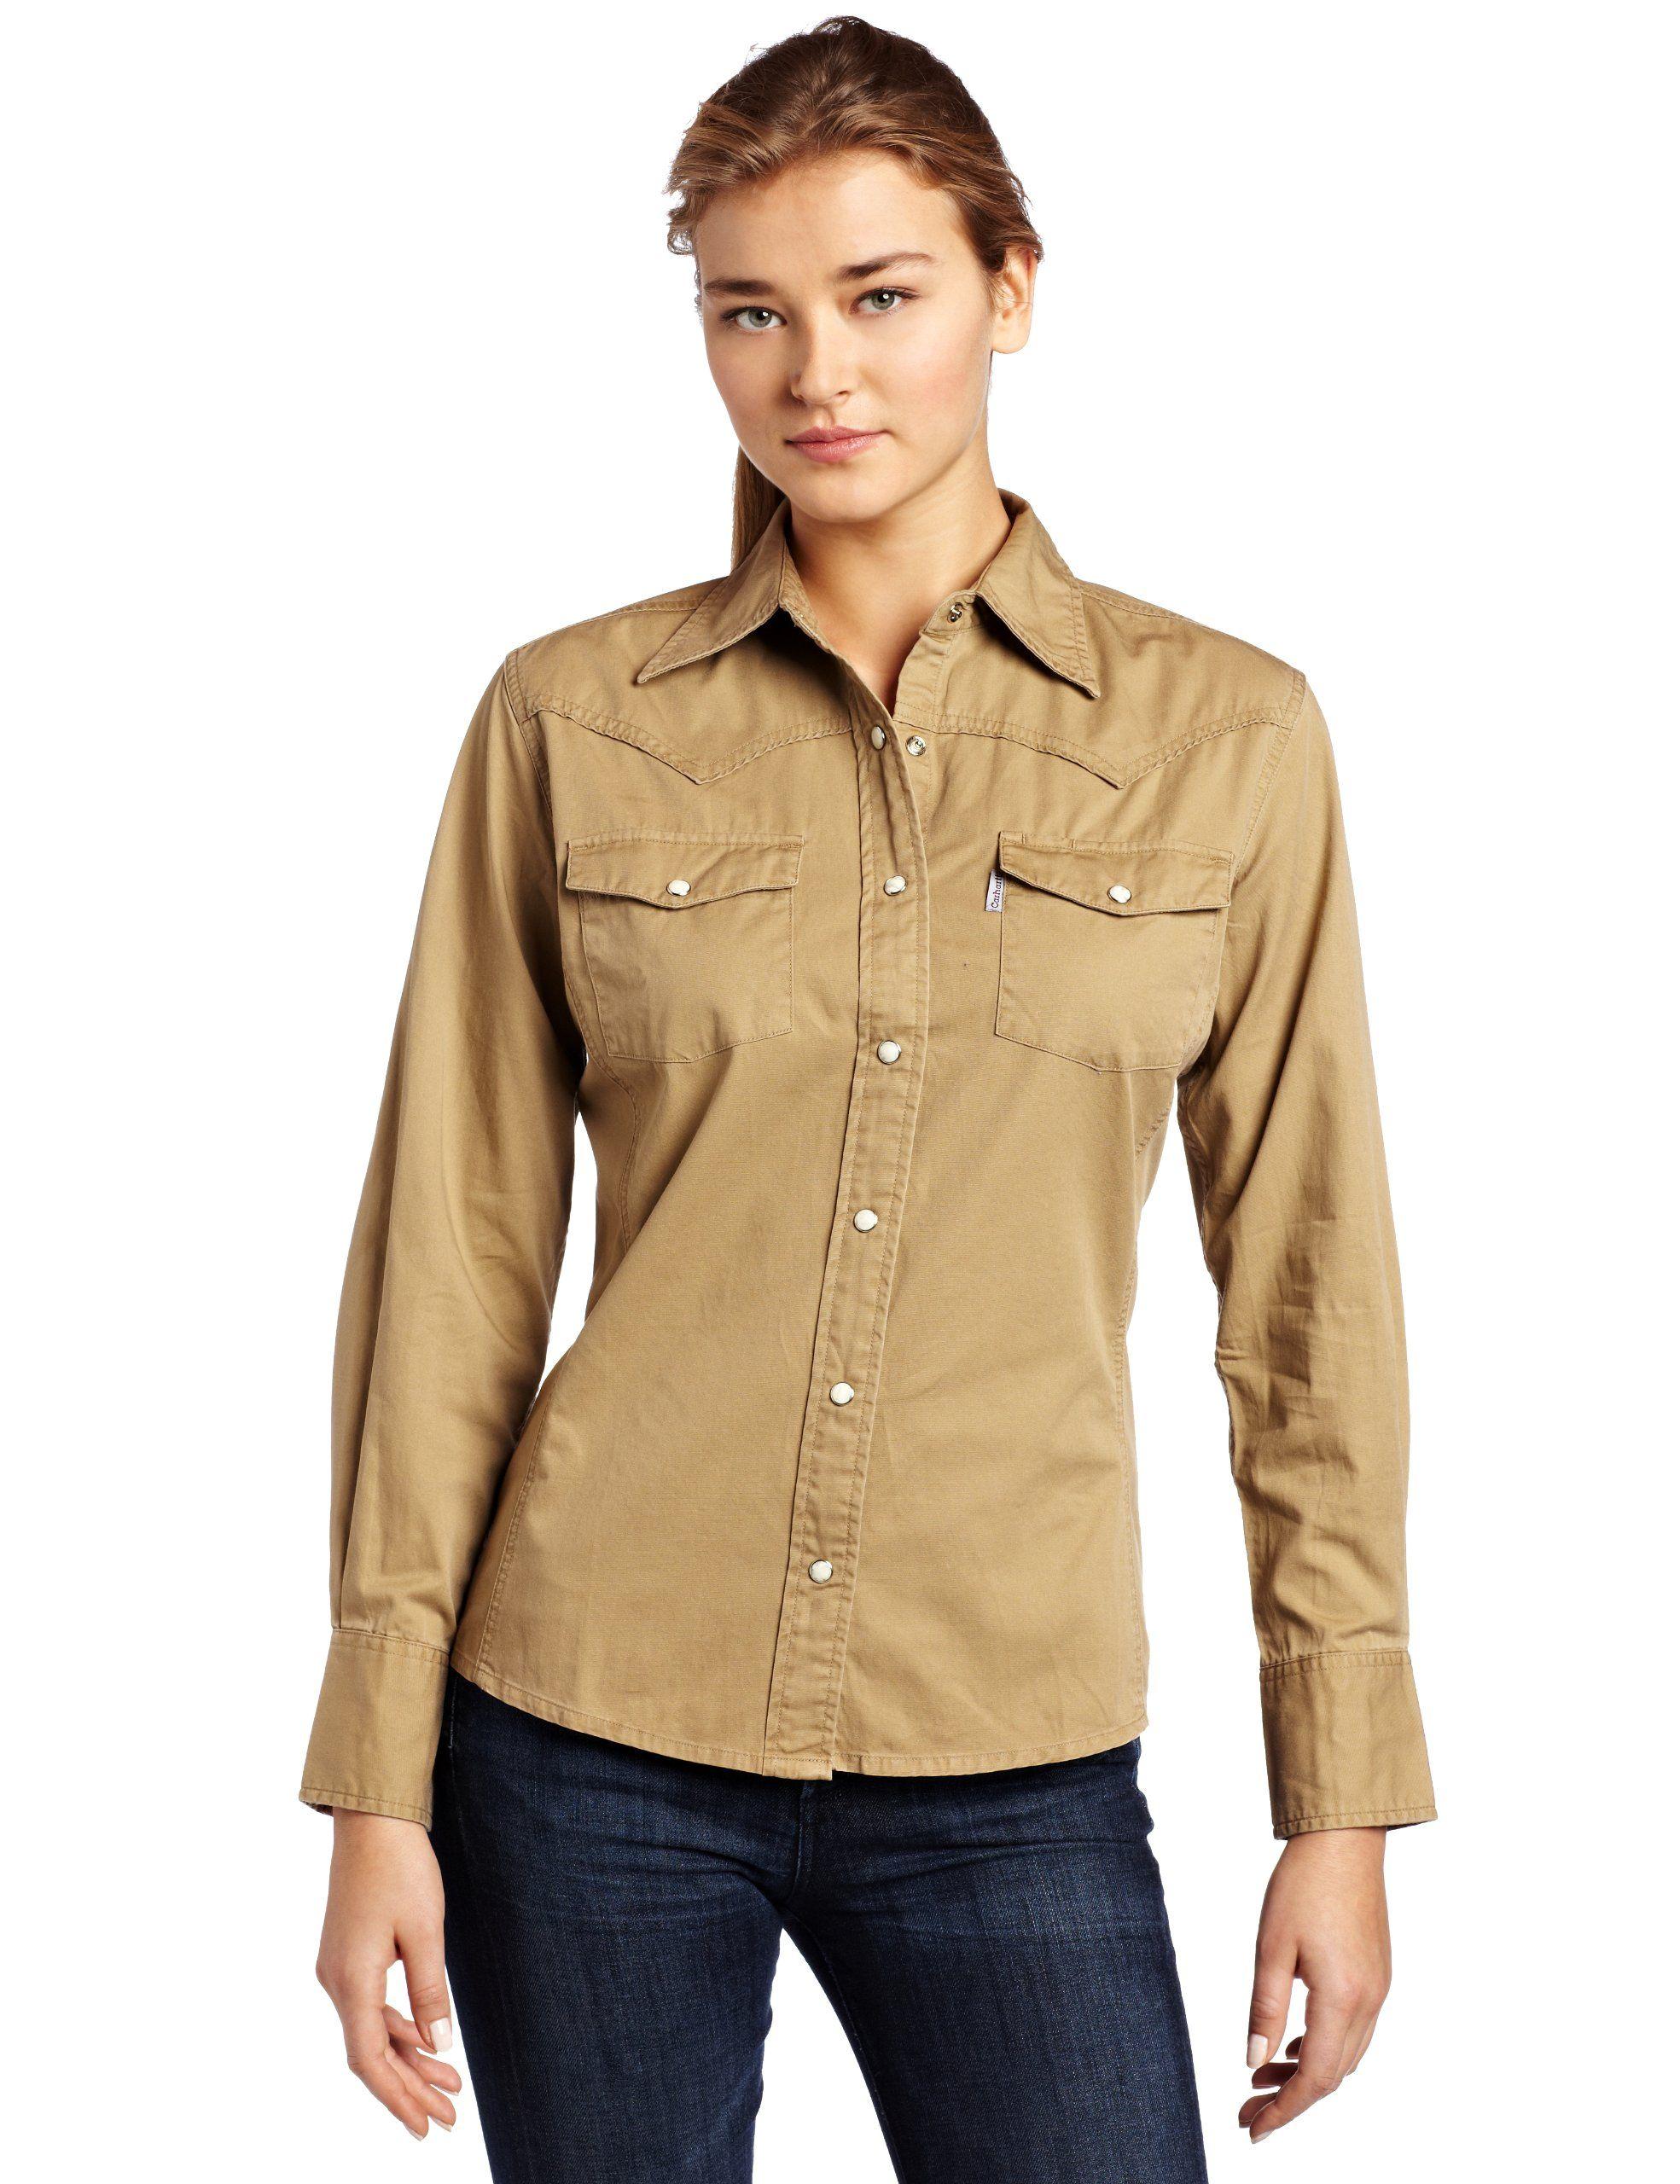 Carhartt Women's Long Sleeve Twill Snap Front Shirt, Dark Khaki, X-Small